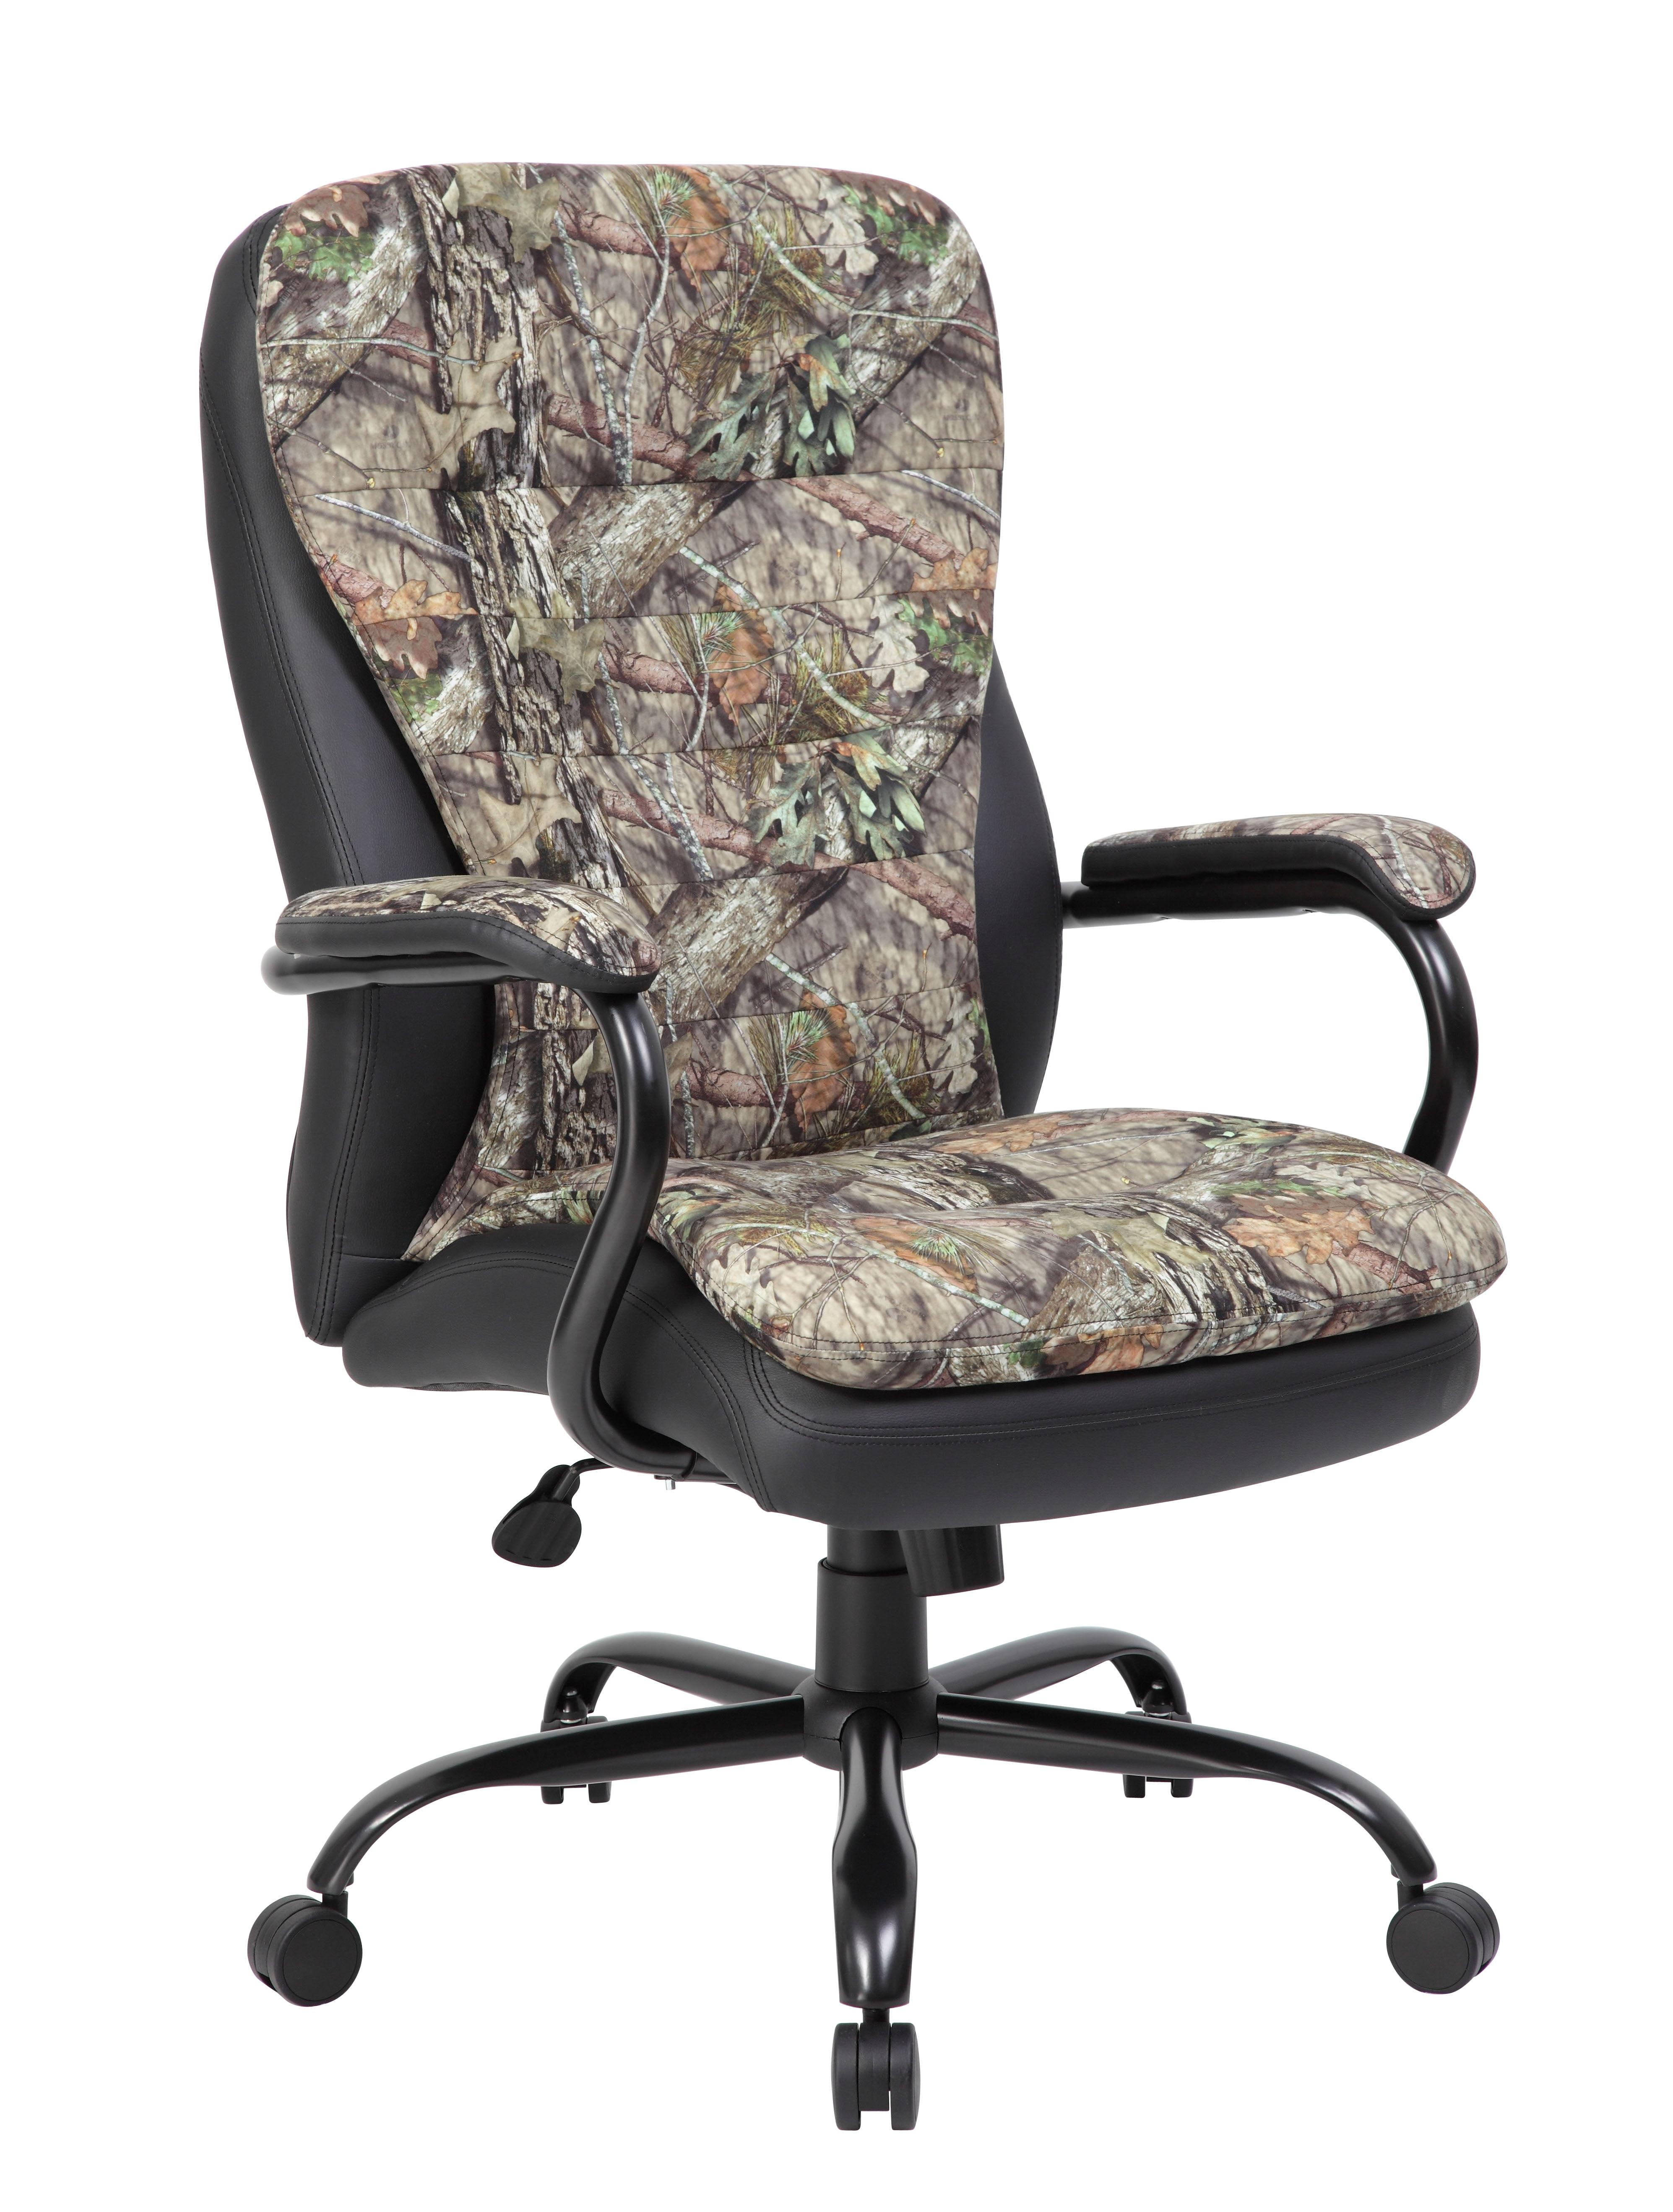 Strange Boss Office Home Mossy Oak Break Up Country Big Tall 400 Lb Capacity Camo Desk Chair Theyellowbook Wood Chair Design Ideas Theyellowbookinfo